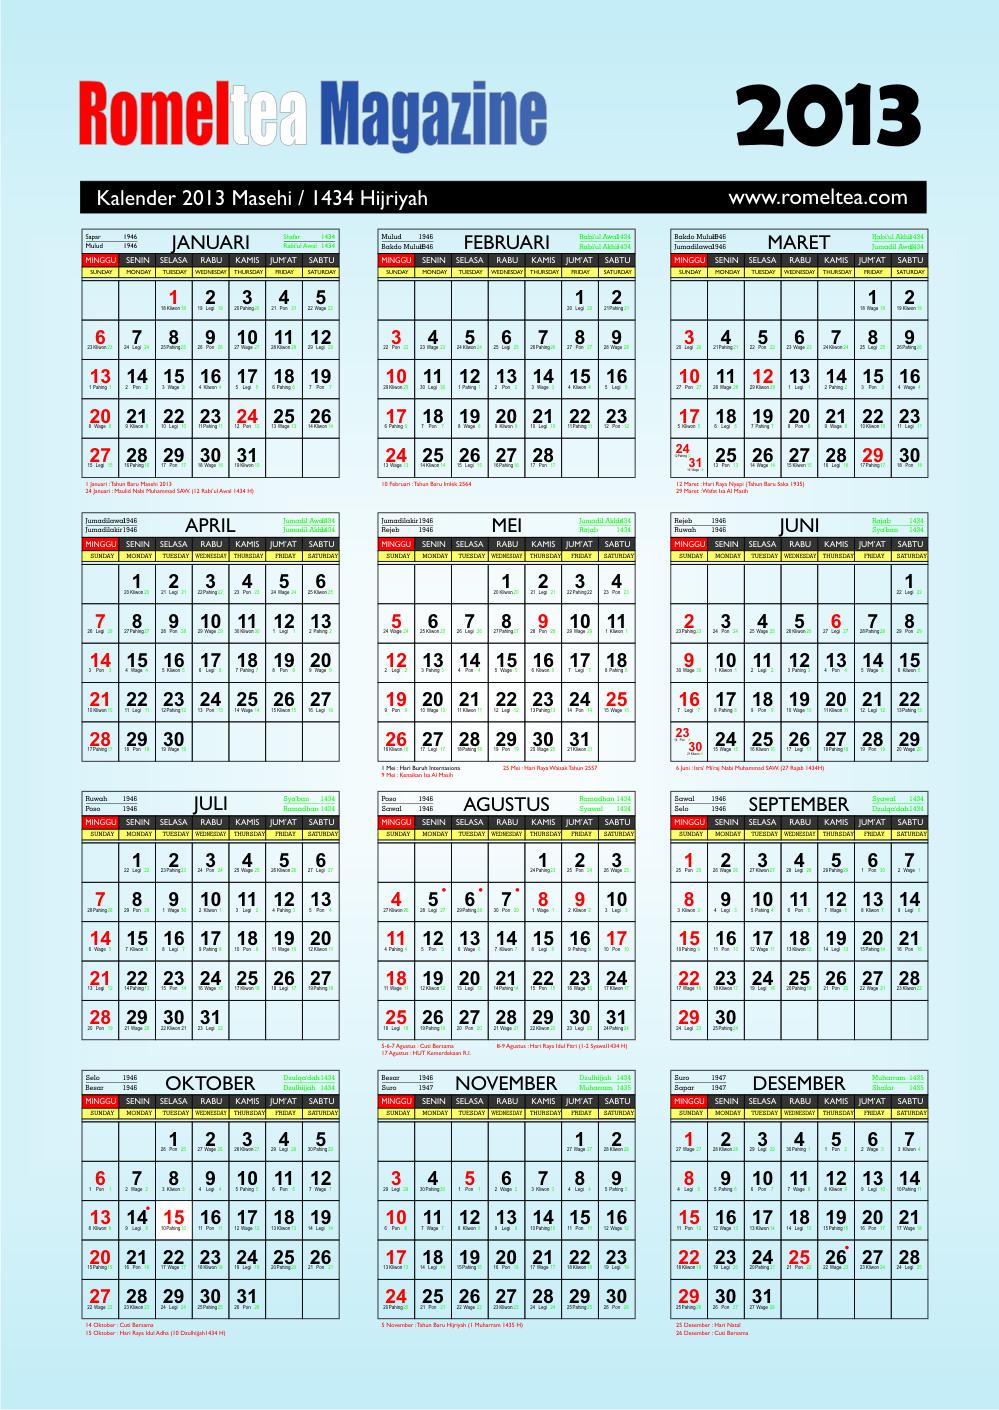 http://4.bp.blogspot.com/-yxwi5QGlKQI/UKImj2G_pyI/AAAAAAAAAmg/P_UImNQwZBw/s1600/kalender+2013-romelteadotcom_big.png